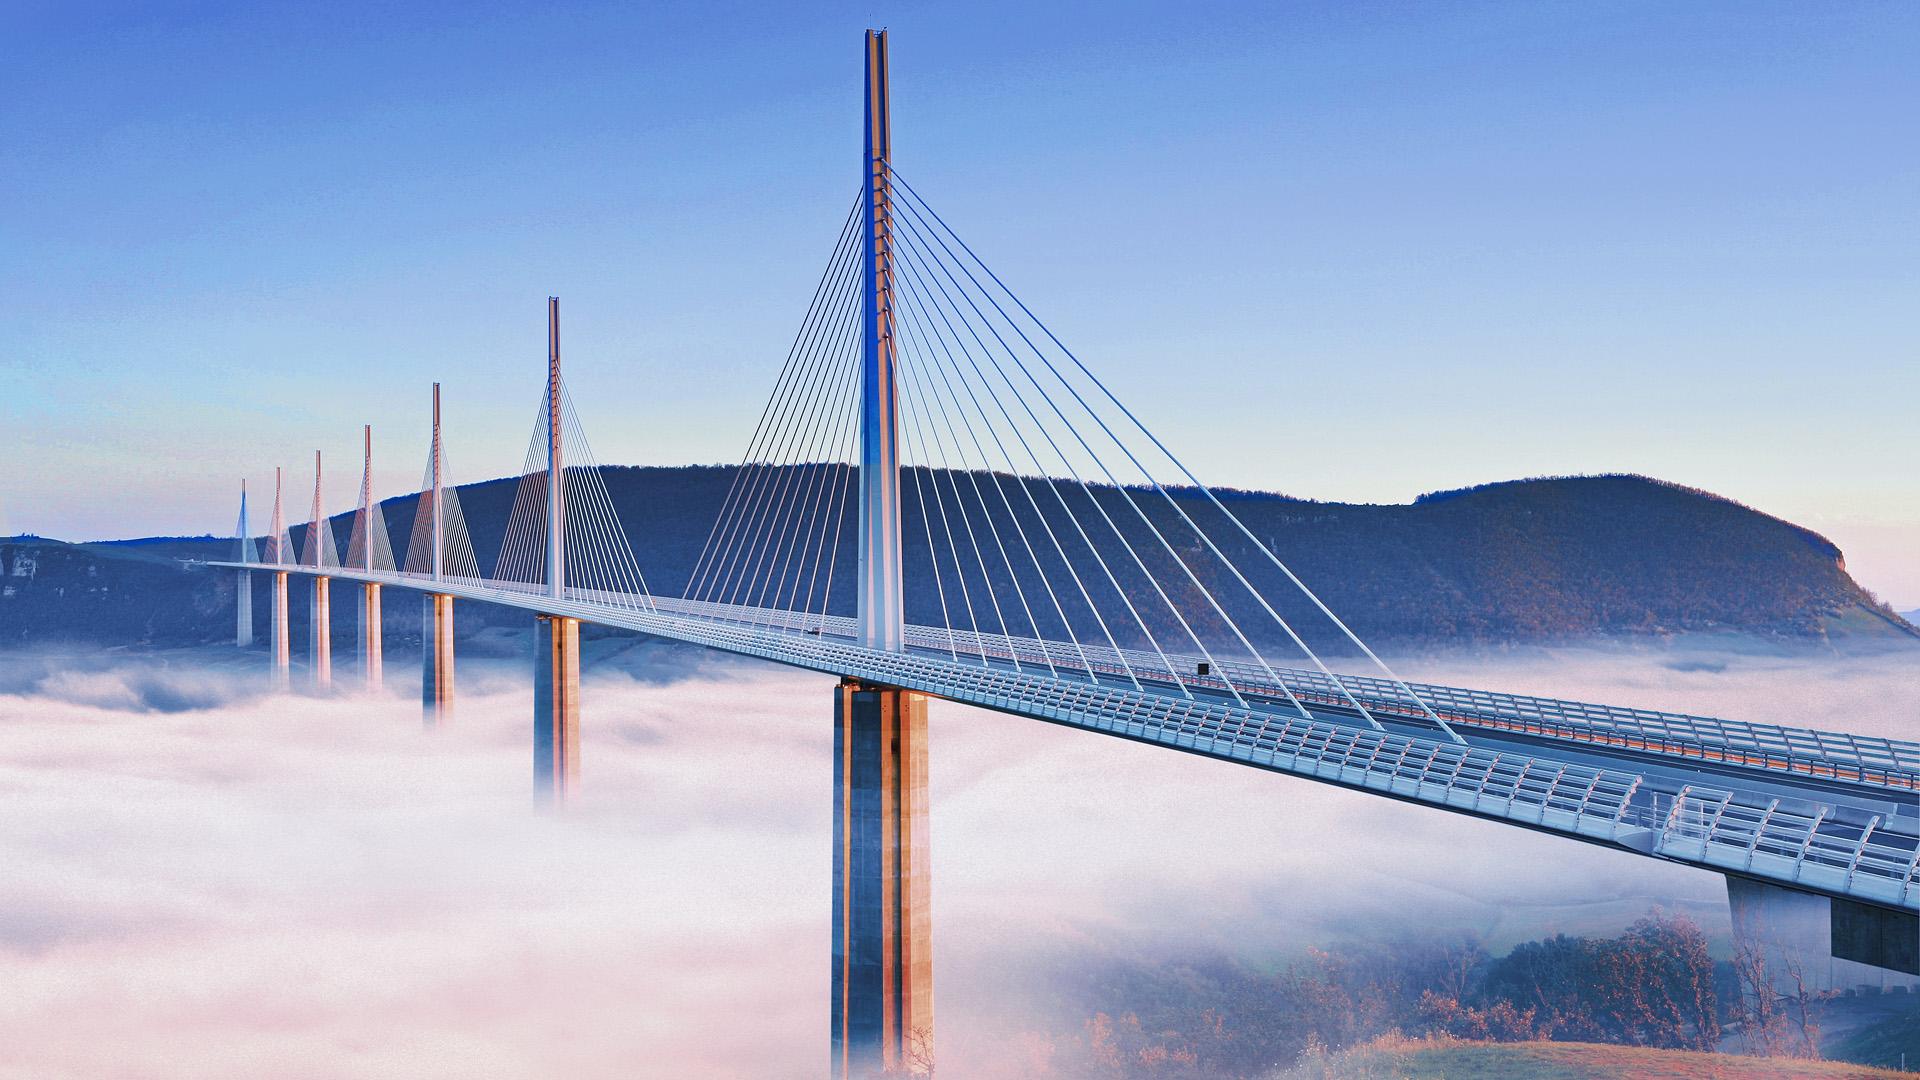 Bridge hd wallpaper background image 1920x1080 id - Bridge wallpaper hd ...